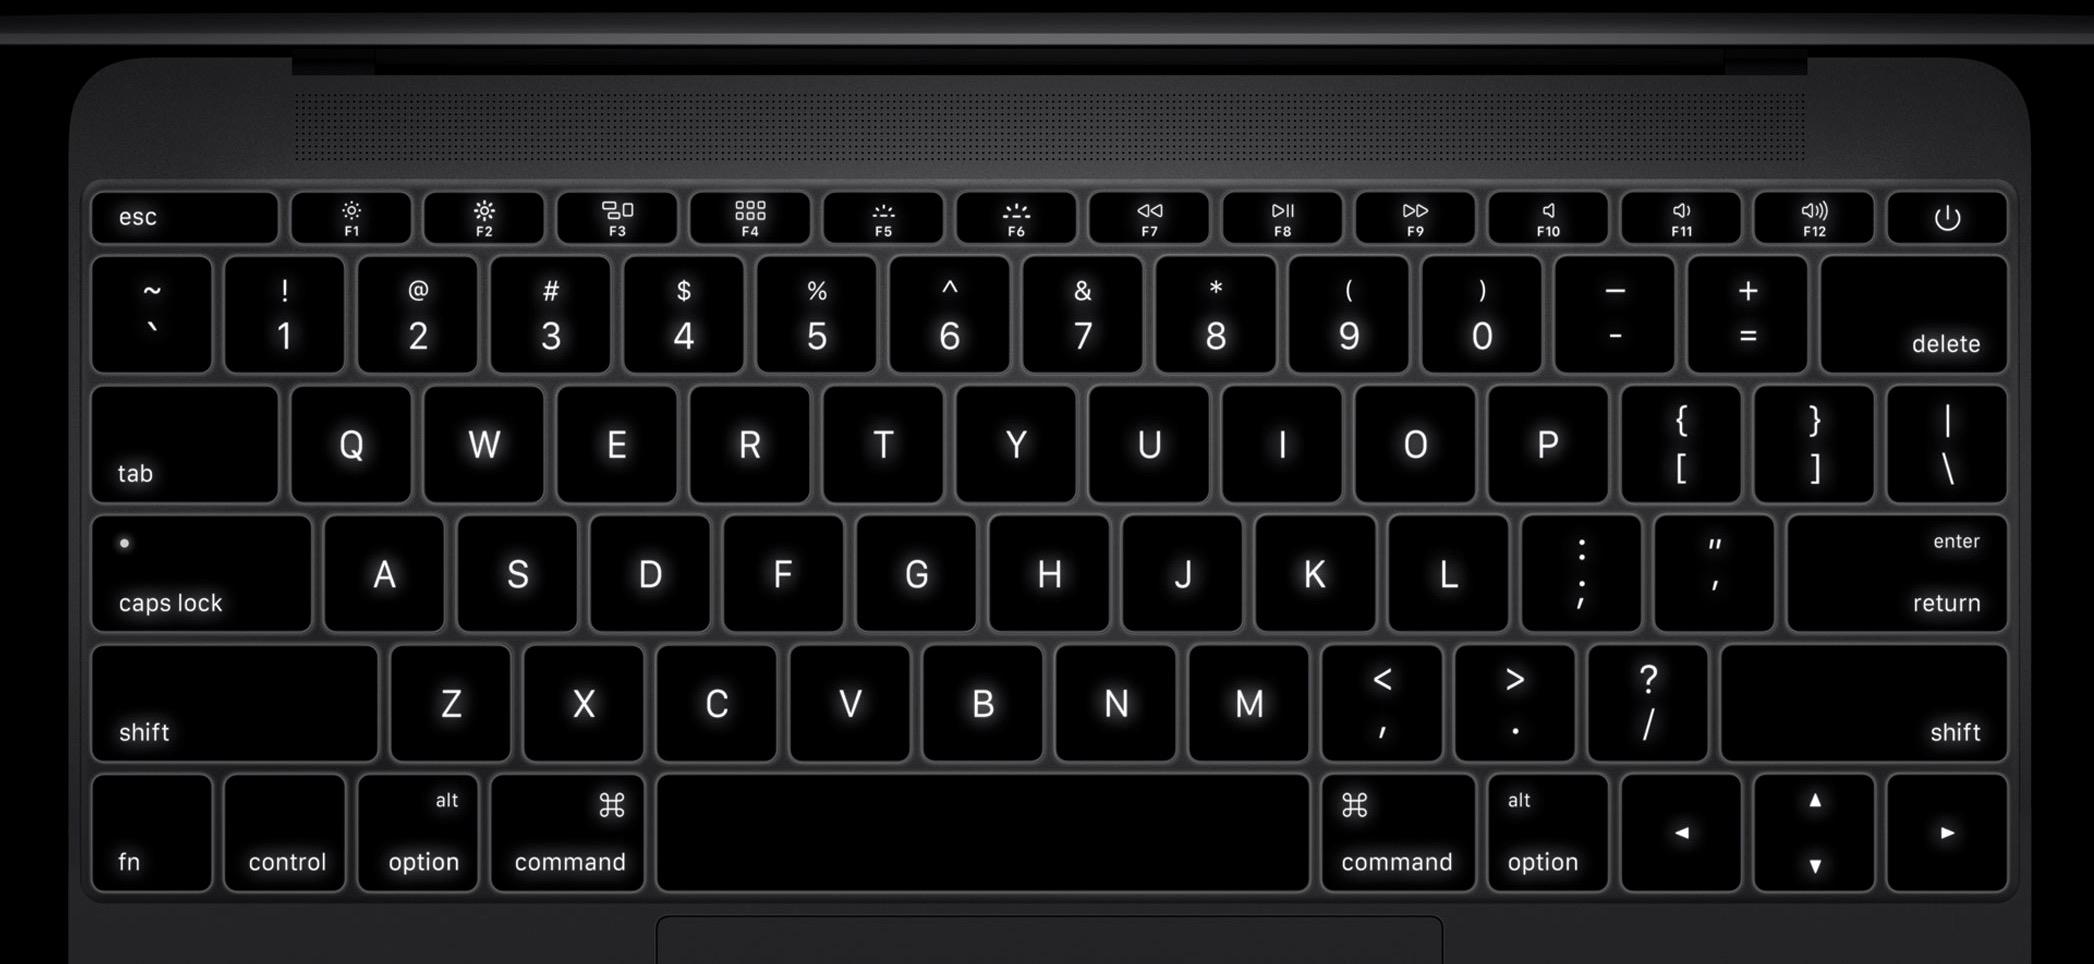 Blacklight_Keyboard_Macbook_12_Tinhte.vn.jpg